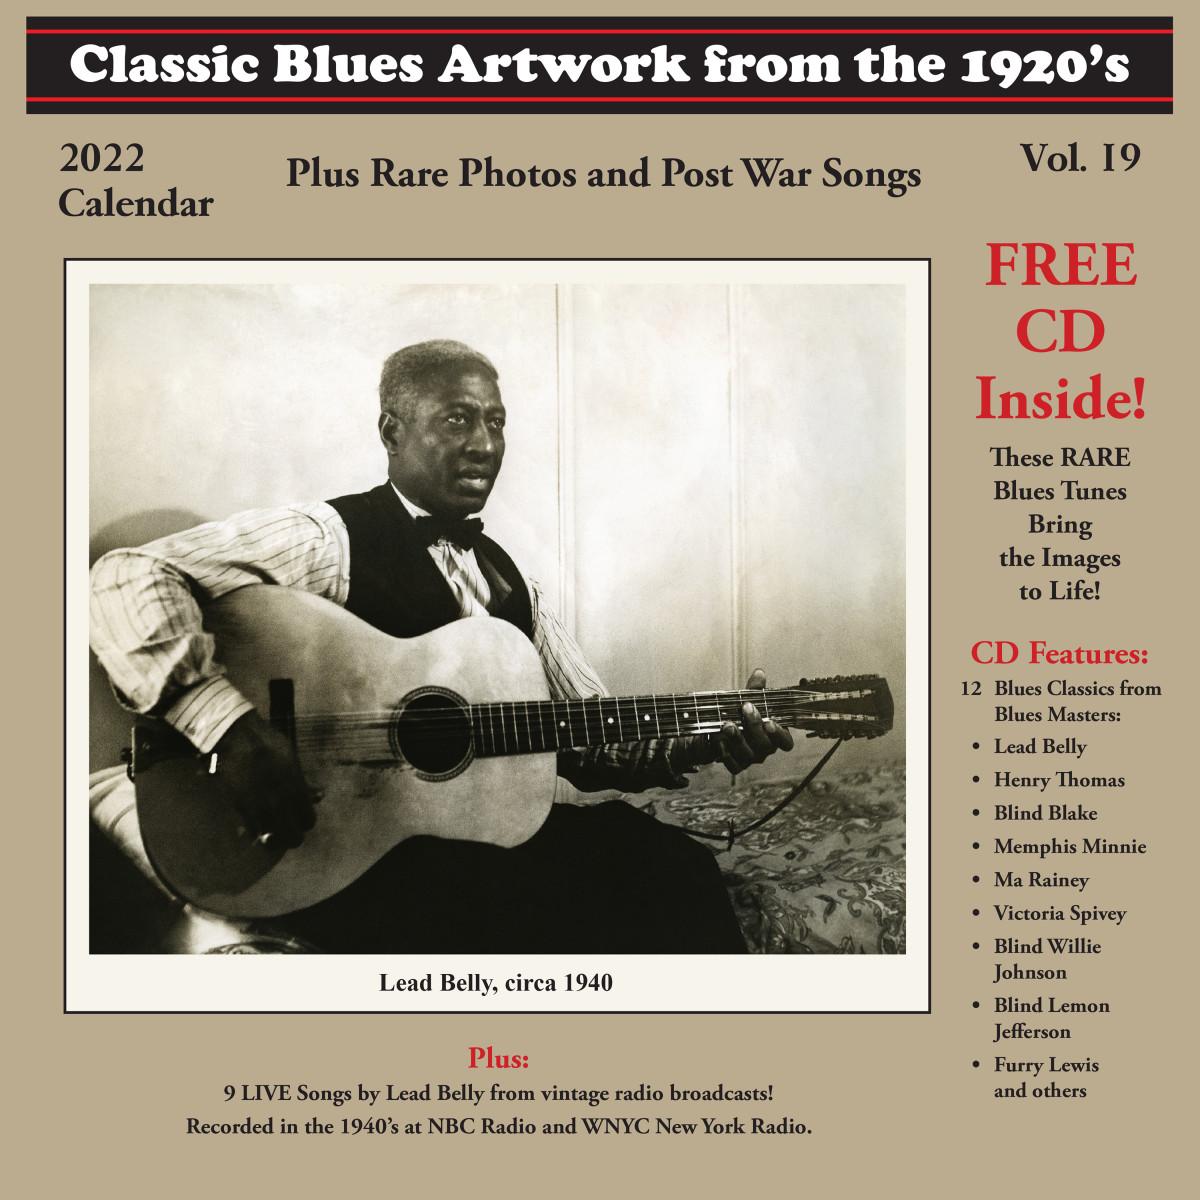 Blues Images 2022 Calendar front cover (300 dpi, 10x10)